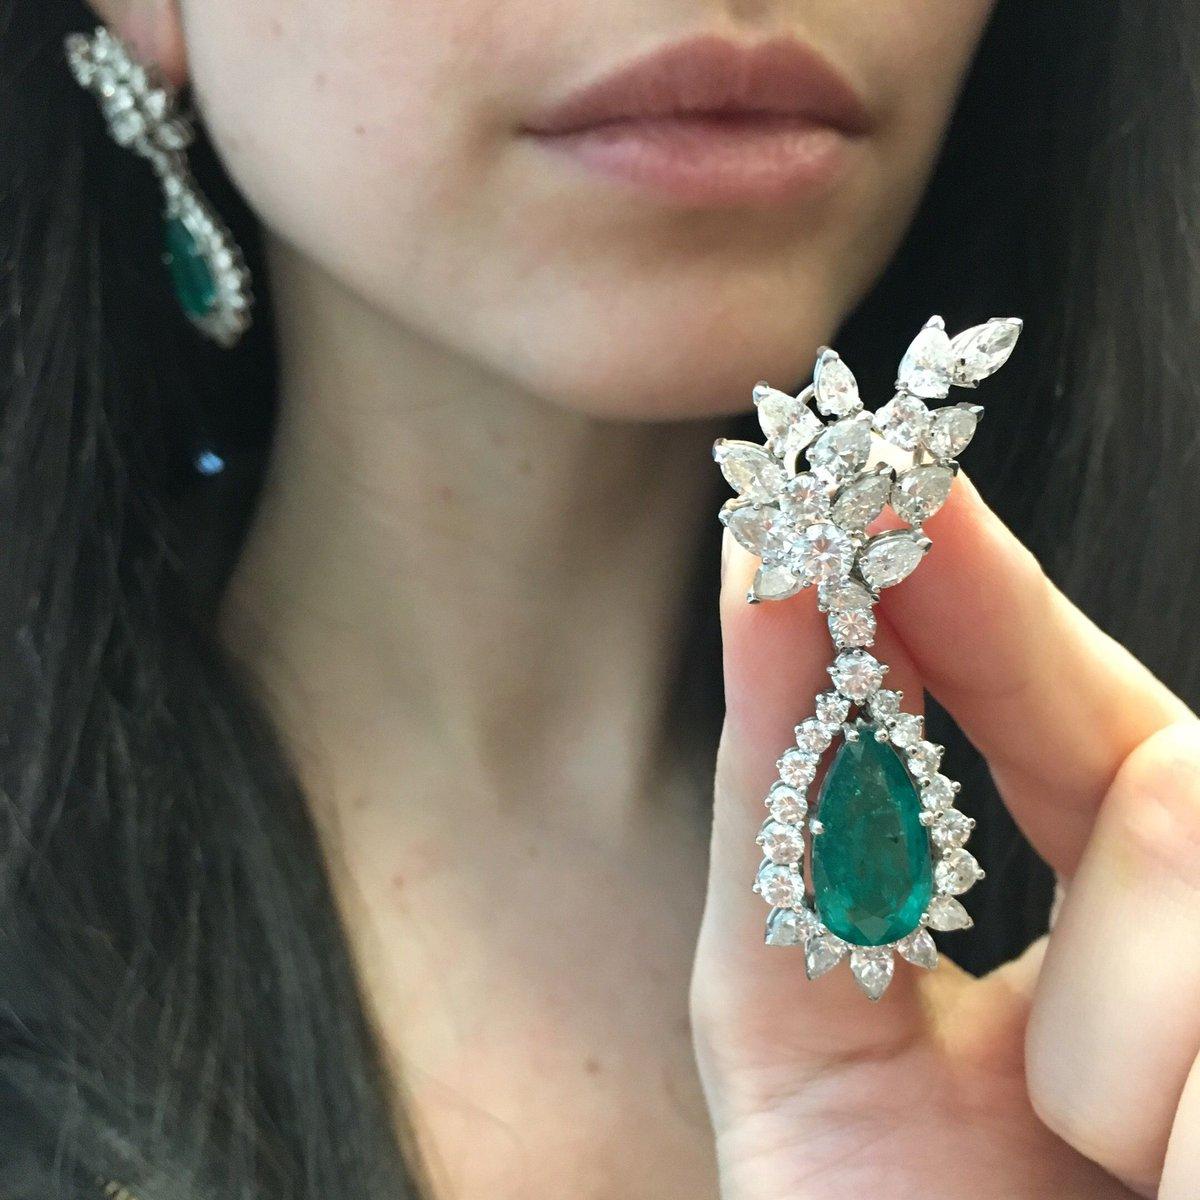 selljewelry hashtag on Twitter